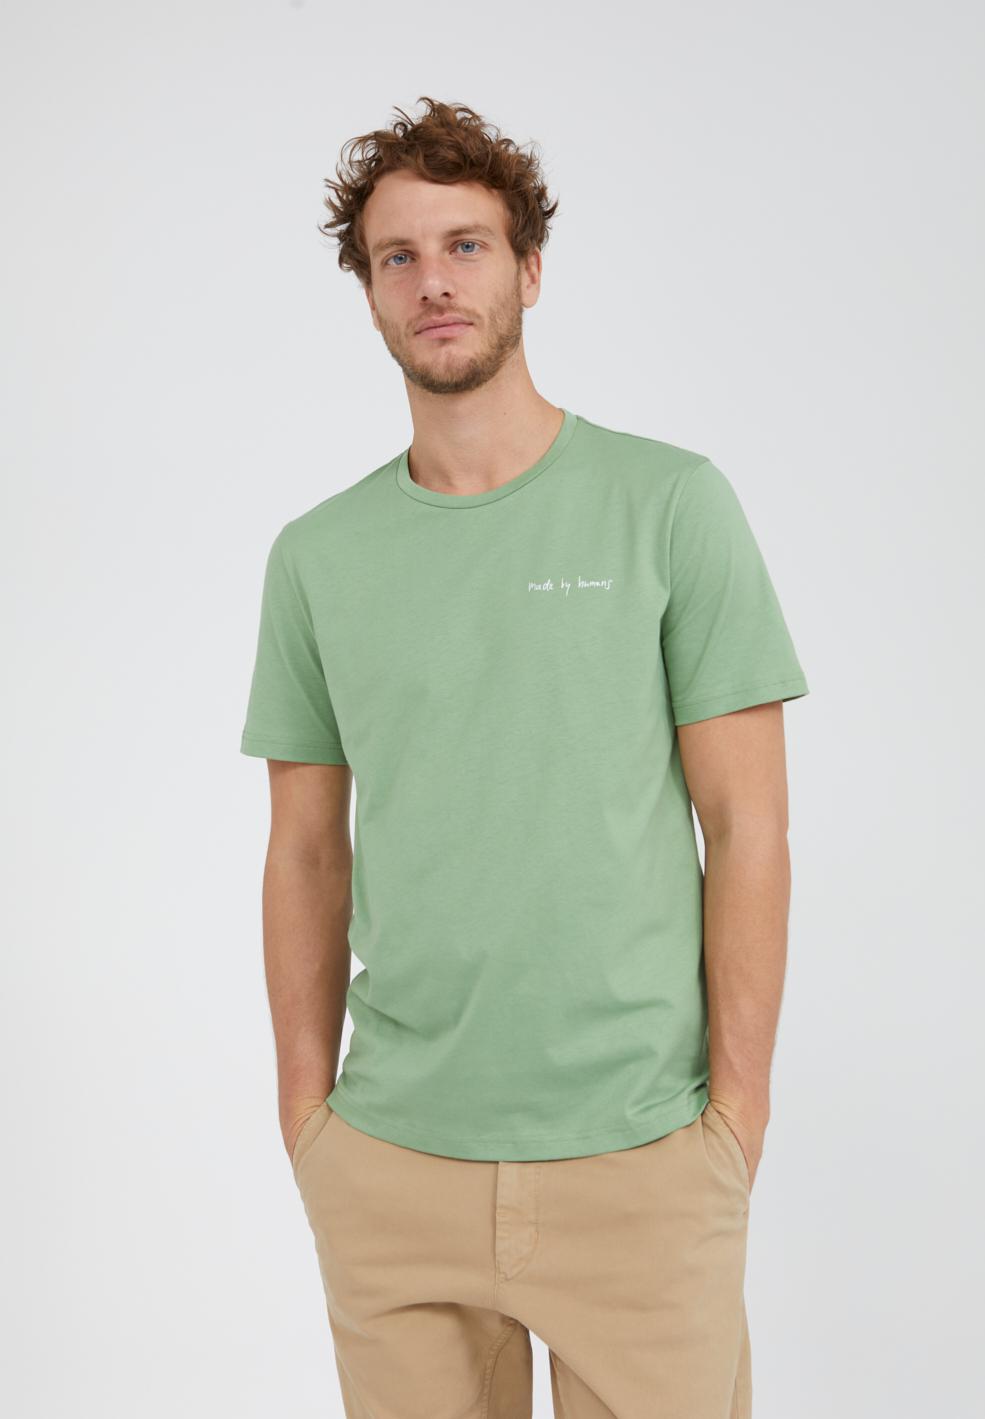 ARMEDANGELS-JAAMES-STATEMENT-T-Shirt-misty-grass